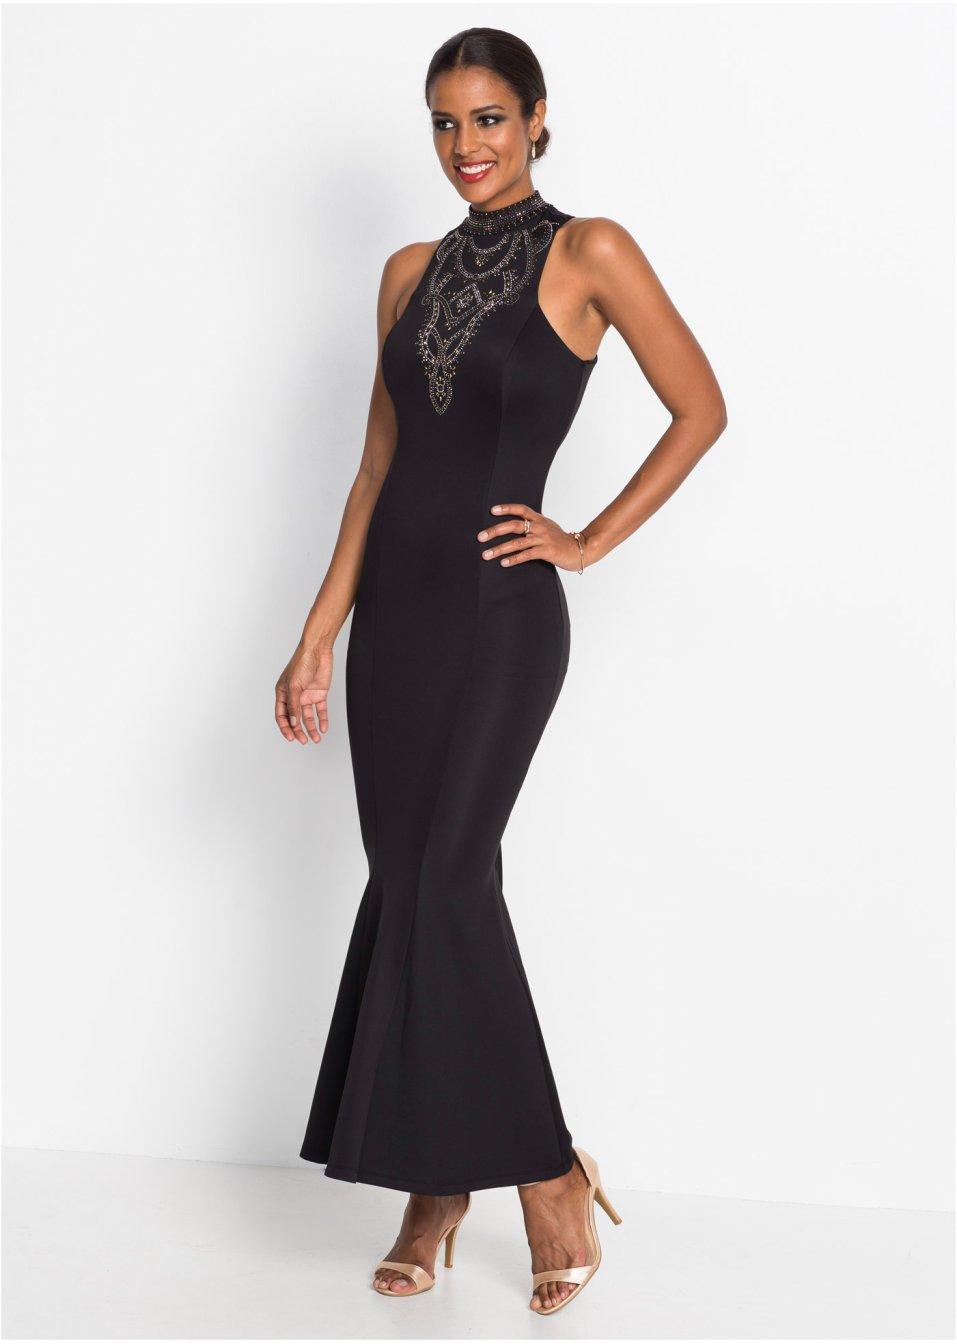 Abendkleid schwarz - Damen - bonprix.at